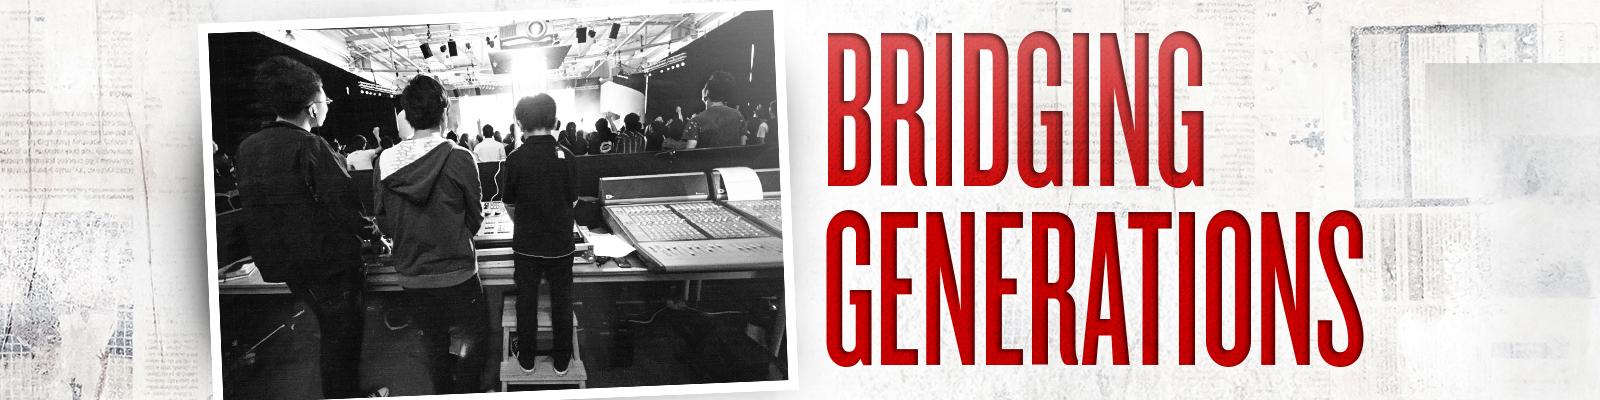 Bridging Generations